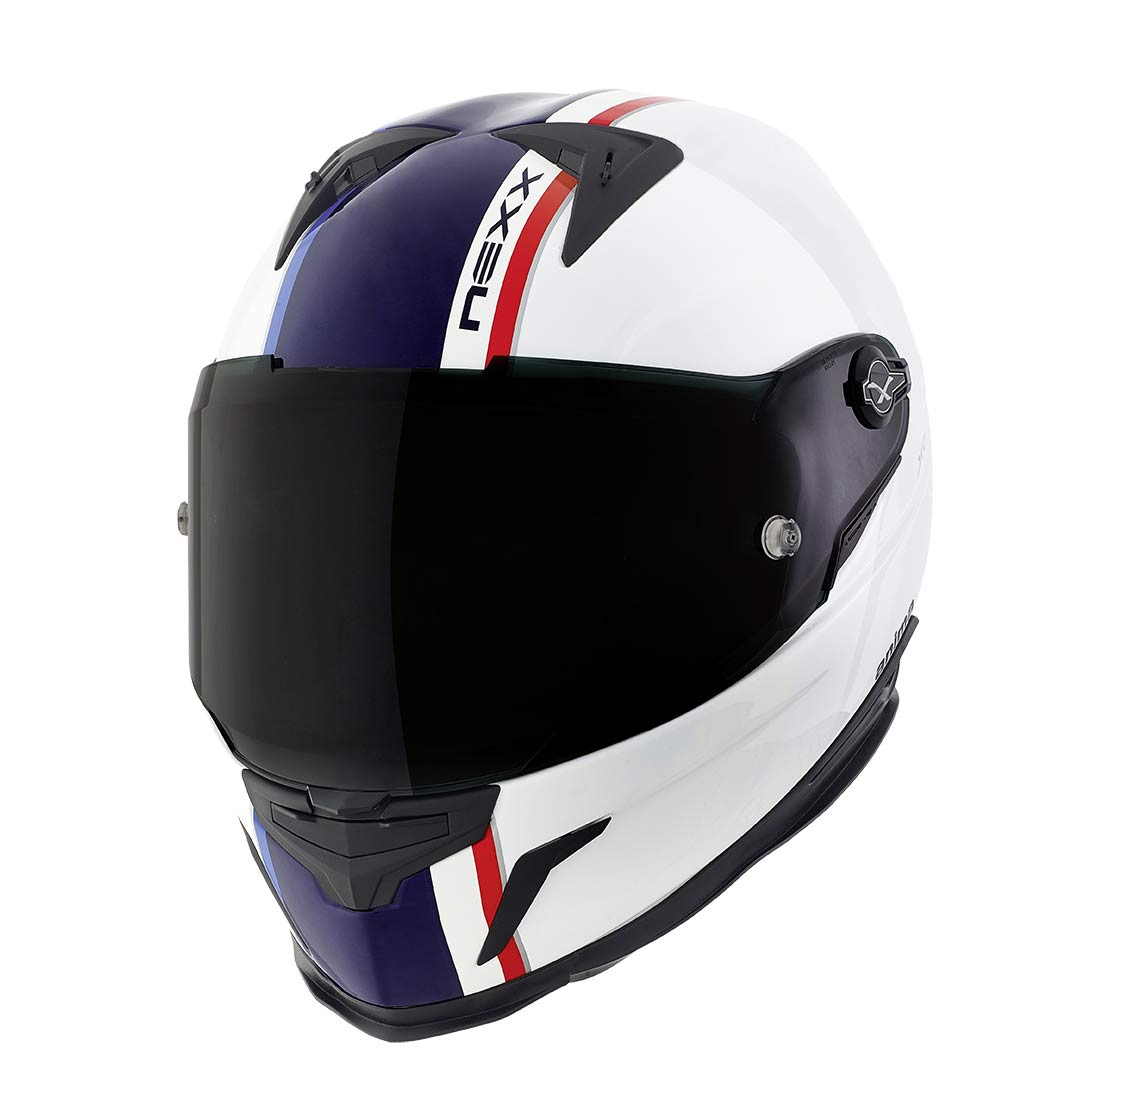 Capacete Nexx XR2 Anima Branco/Azul Tri-Composto  - Mês do Motociclista